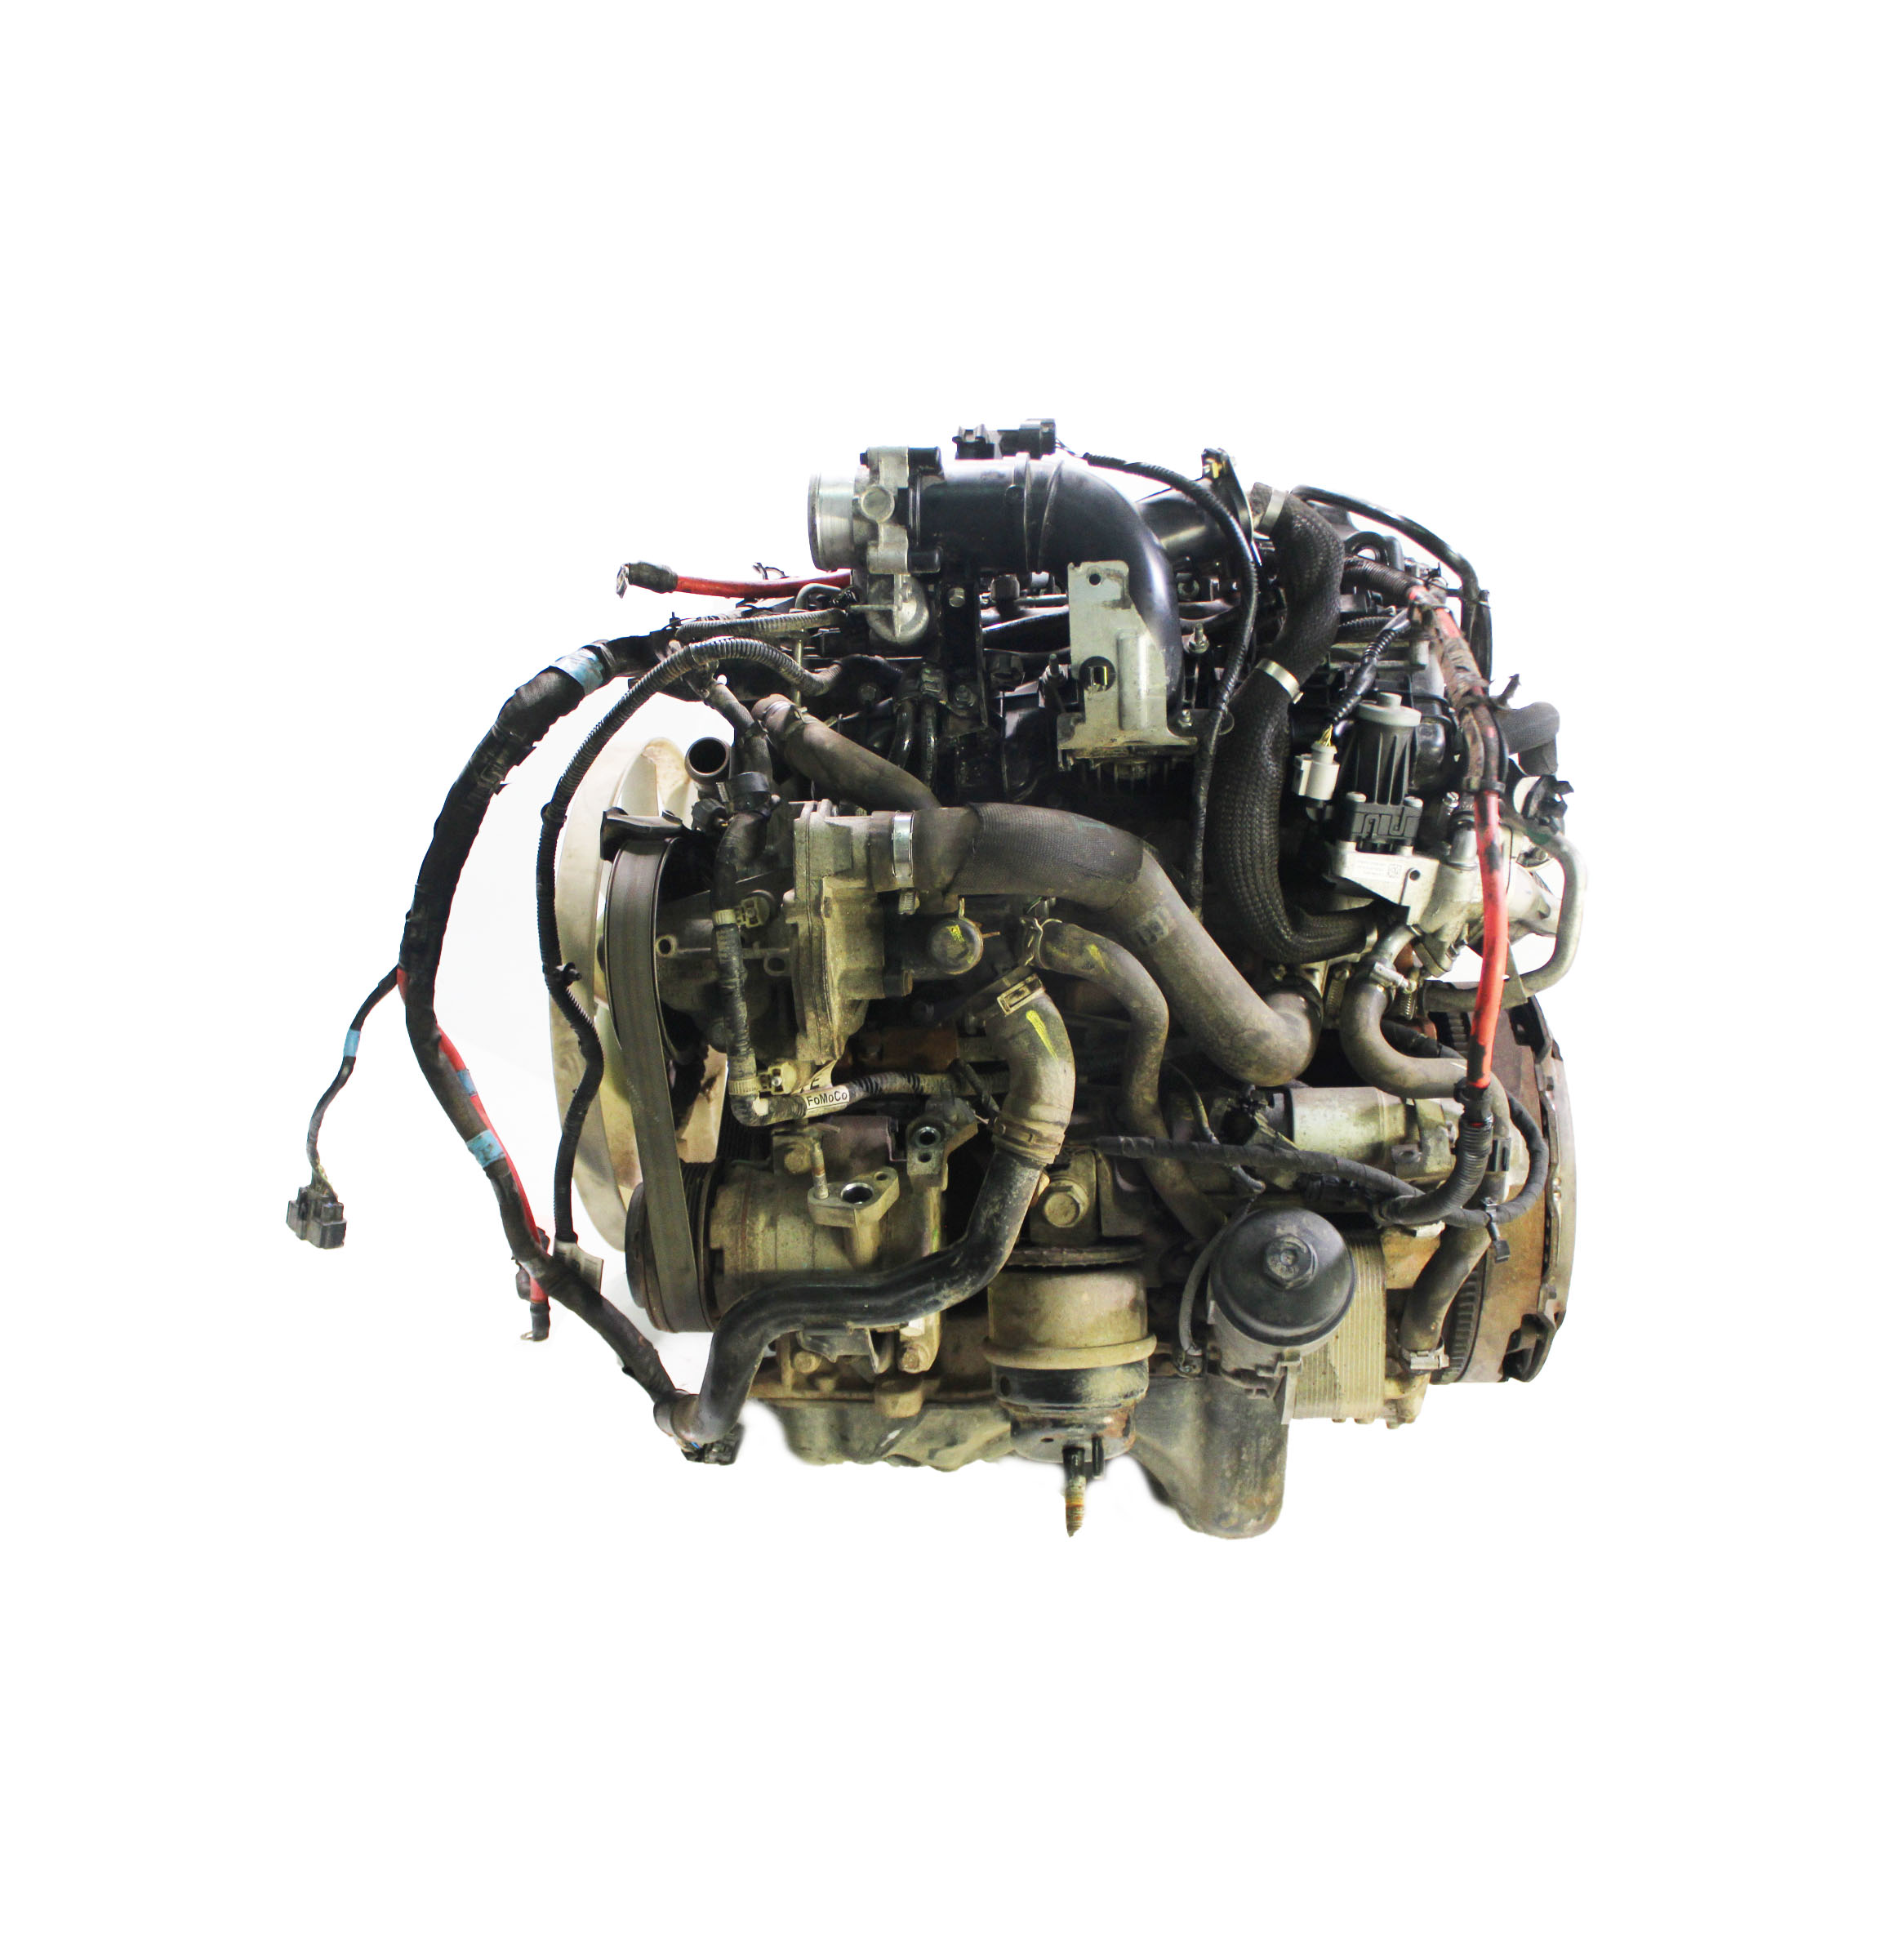 Motor für Ford Ranger TKE 2,2 TDCi Diesel QJ2W GBVAJQJ